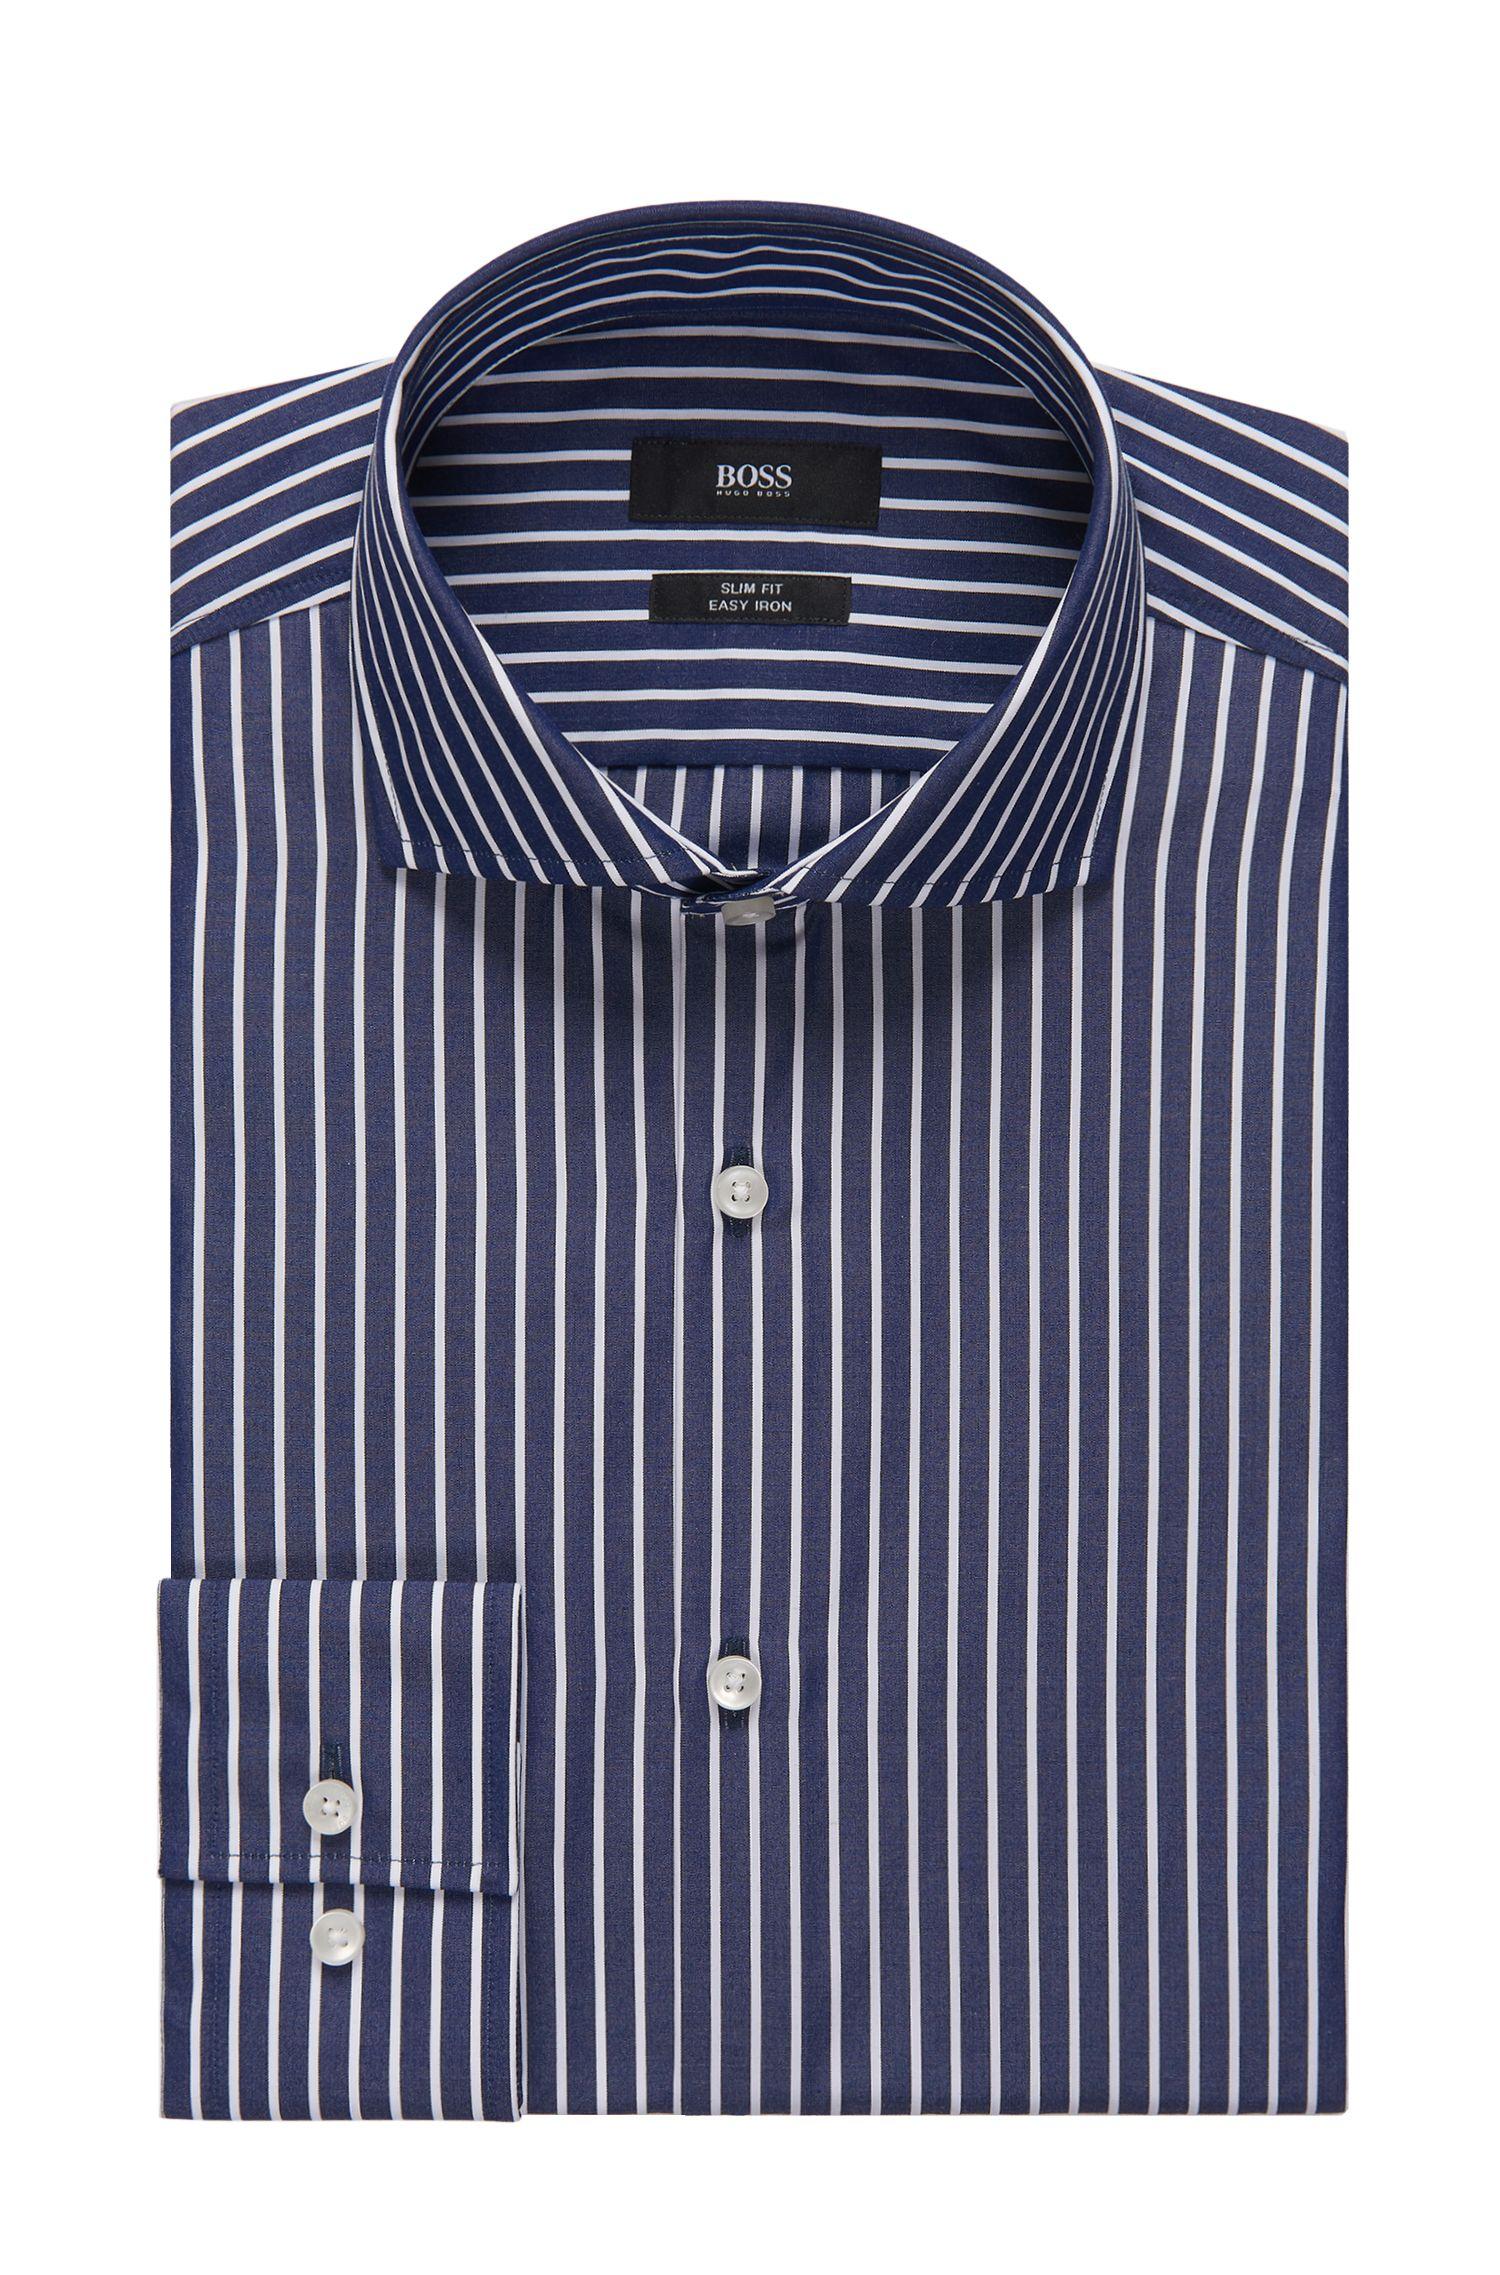 Striped Easy-Iron Cotton Dress Shirt, Slim Fit| Jason